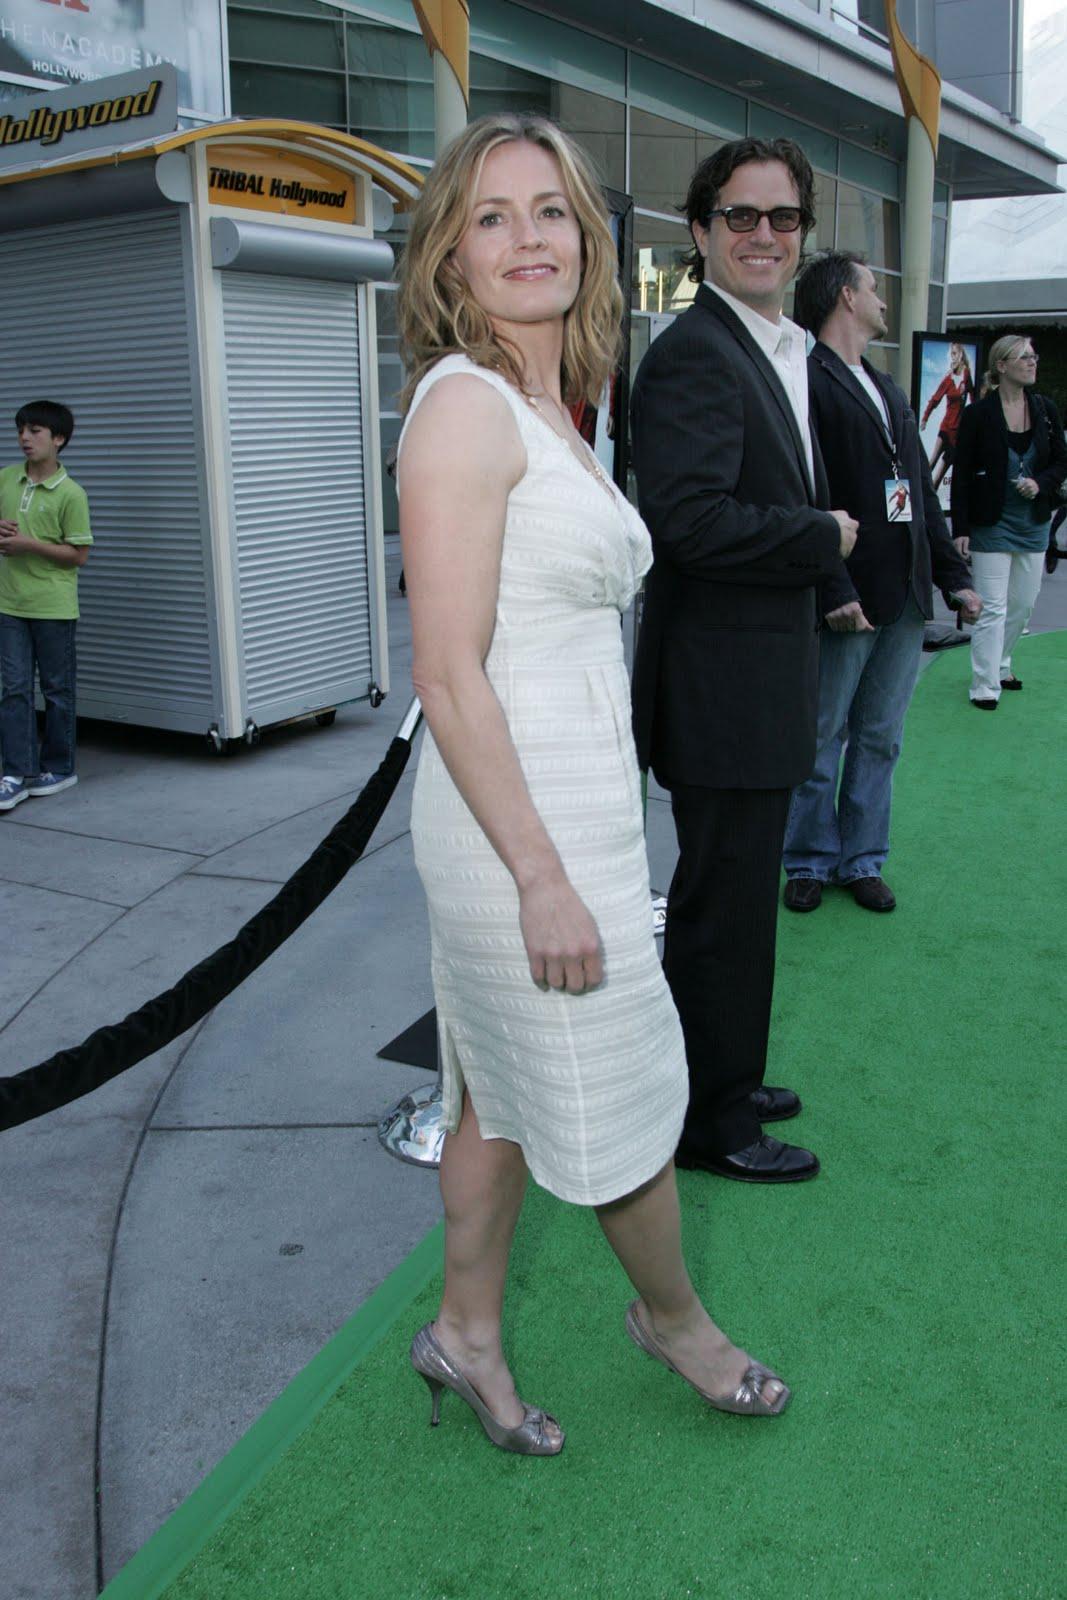 http://2.bp.blogspot.com/_UaLWp72nij4/S7Uqr8UHefI/AAAAAAAAF7E/OTbbkUnomKM/s1600/elisabeth-shue-feet-4.jpg